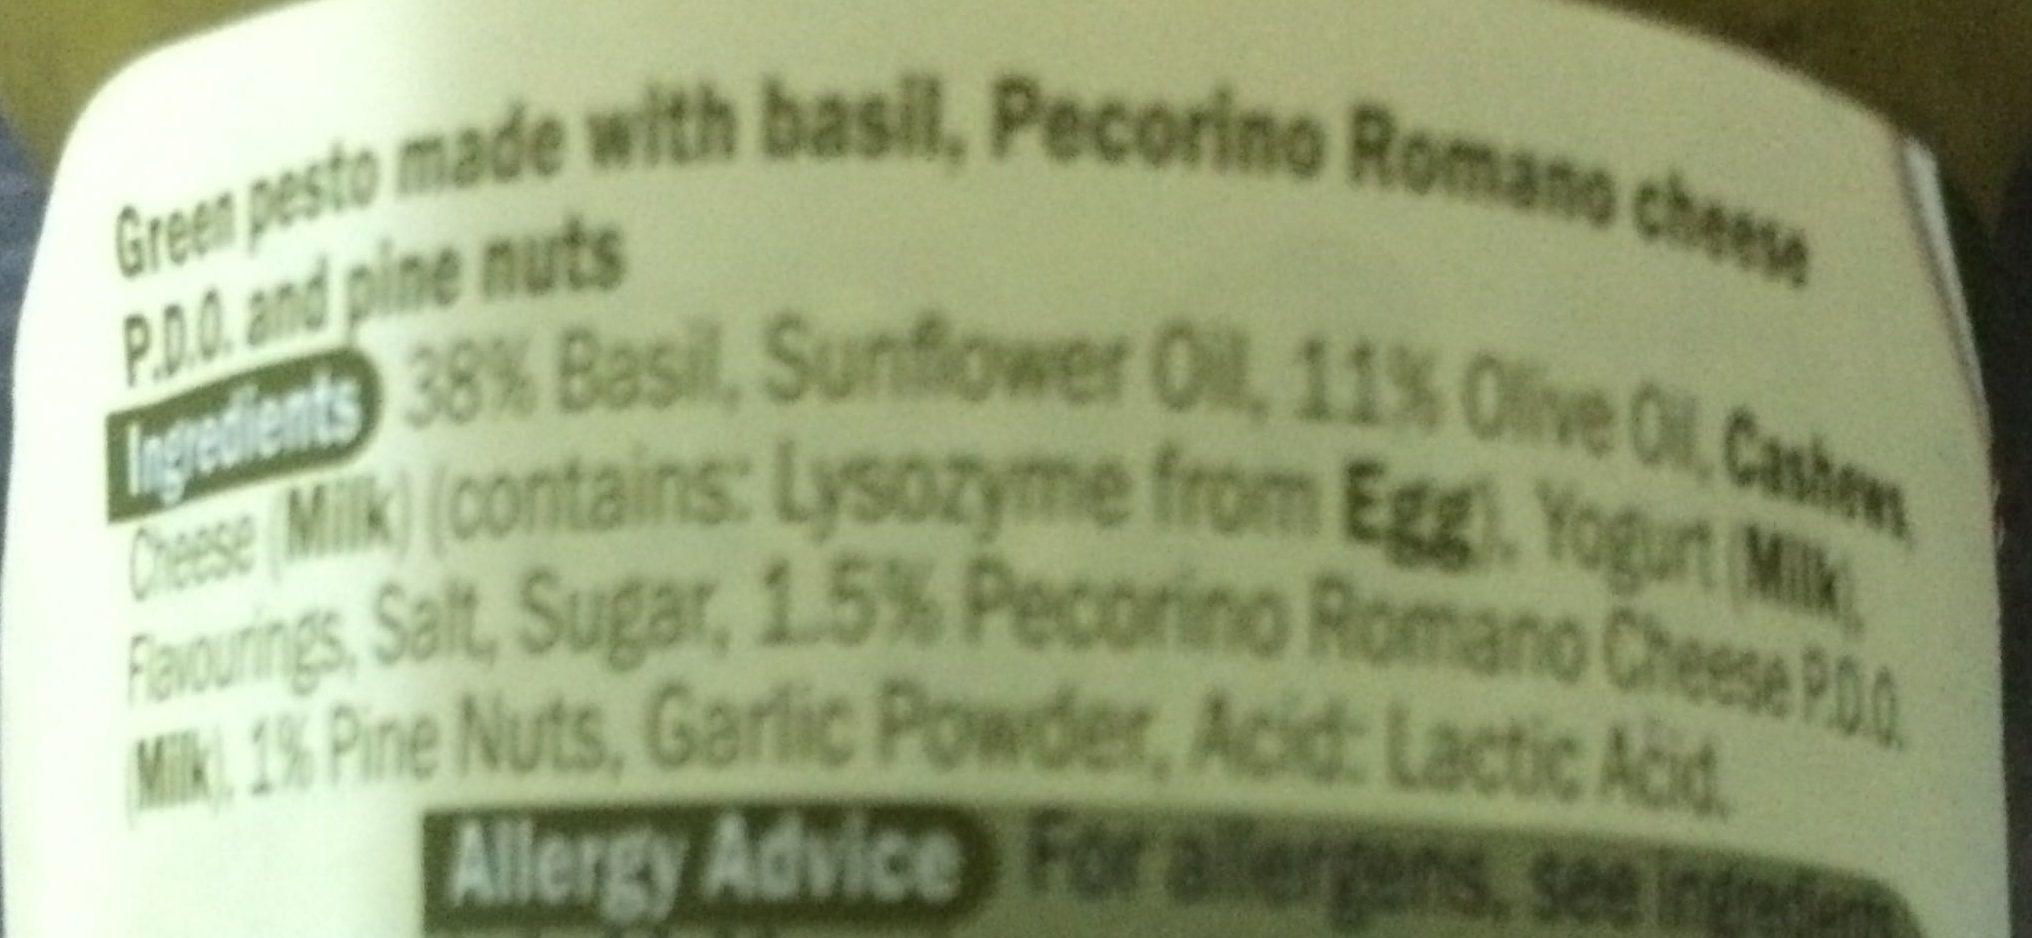 Sauce au basilic - Ingredients - en